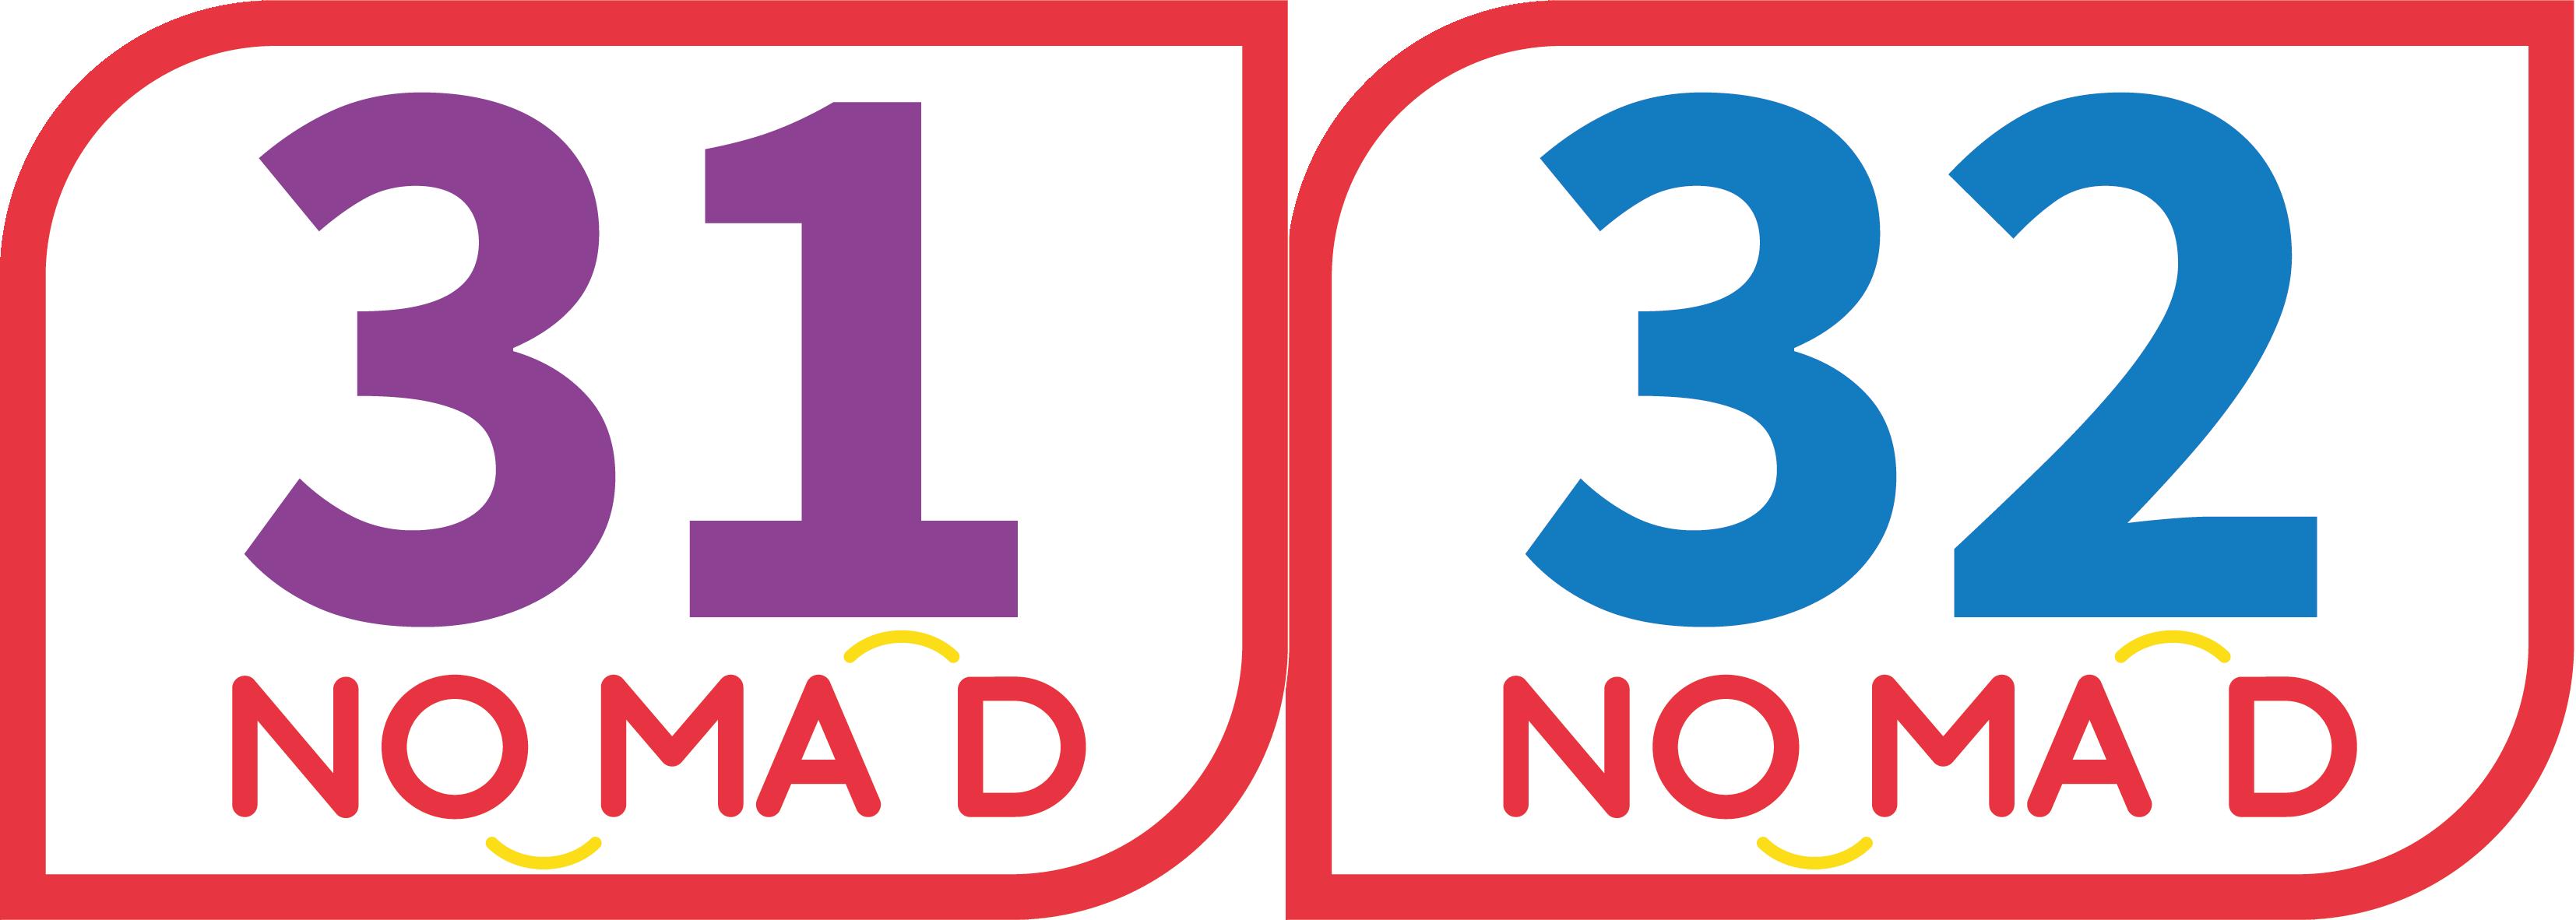 Lignes Nomad 31-32